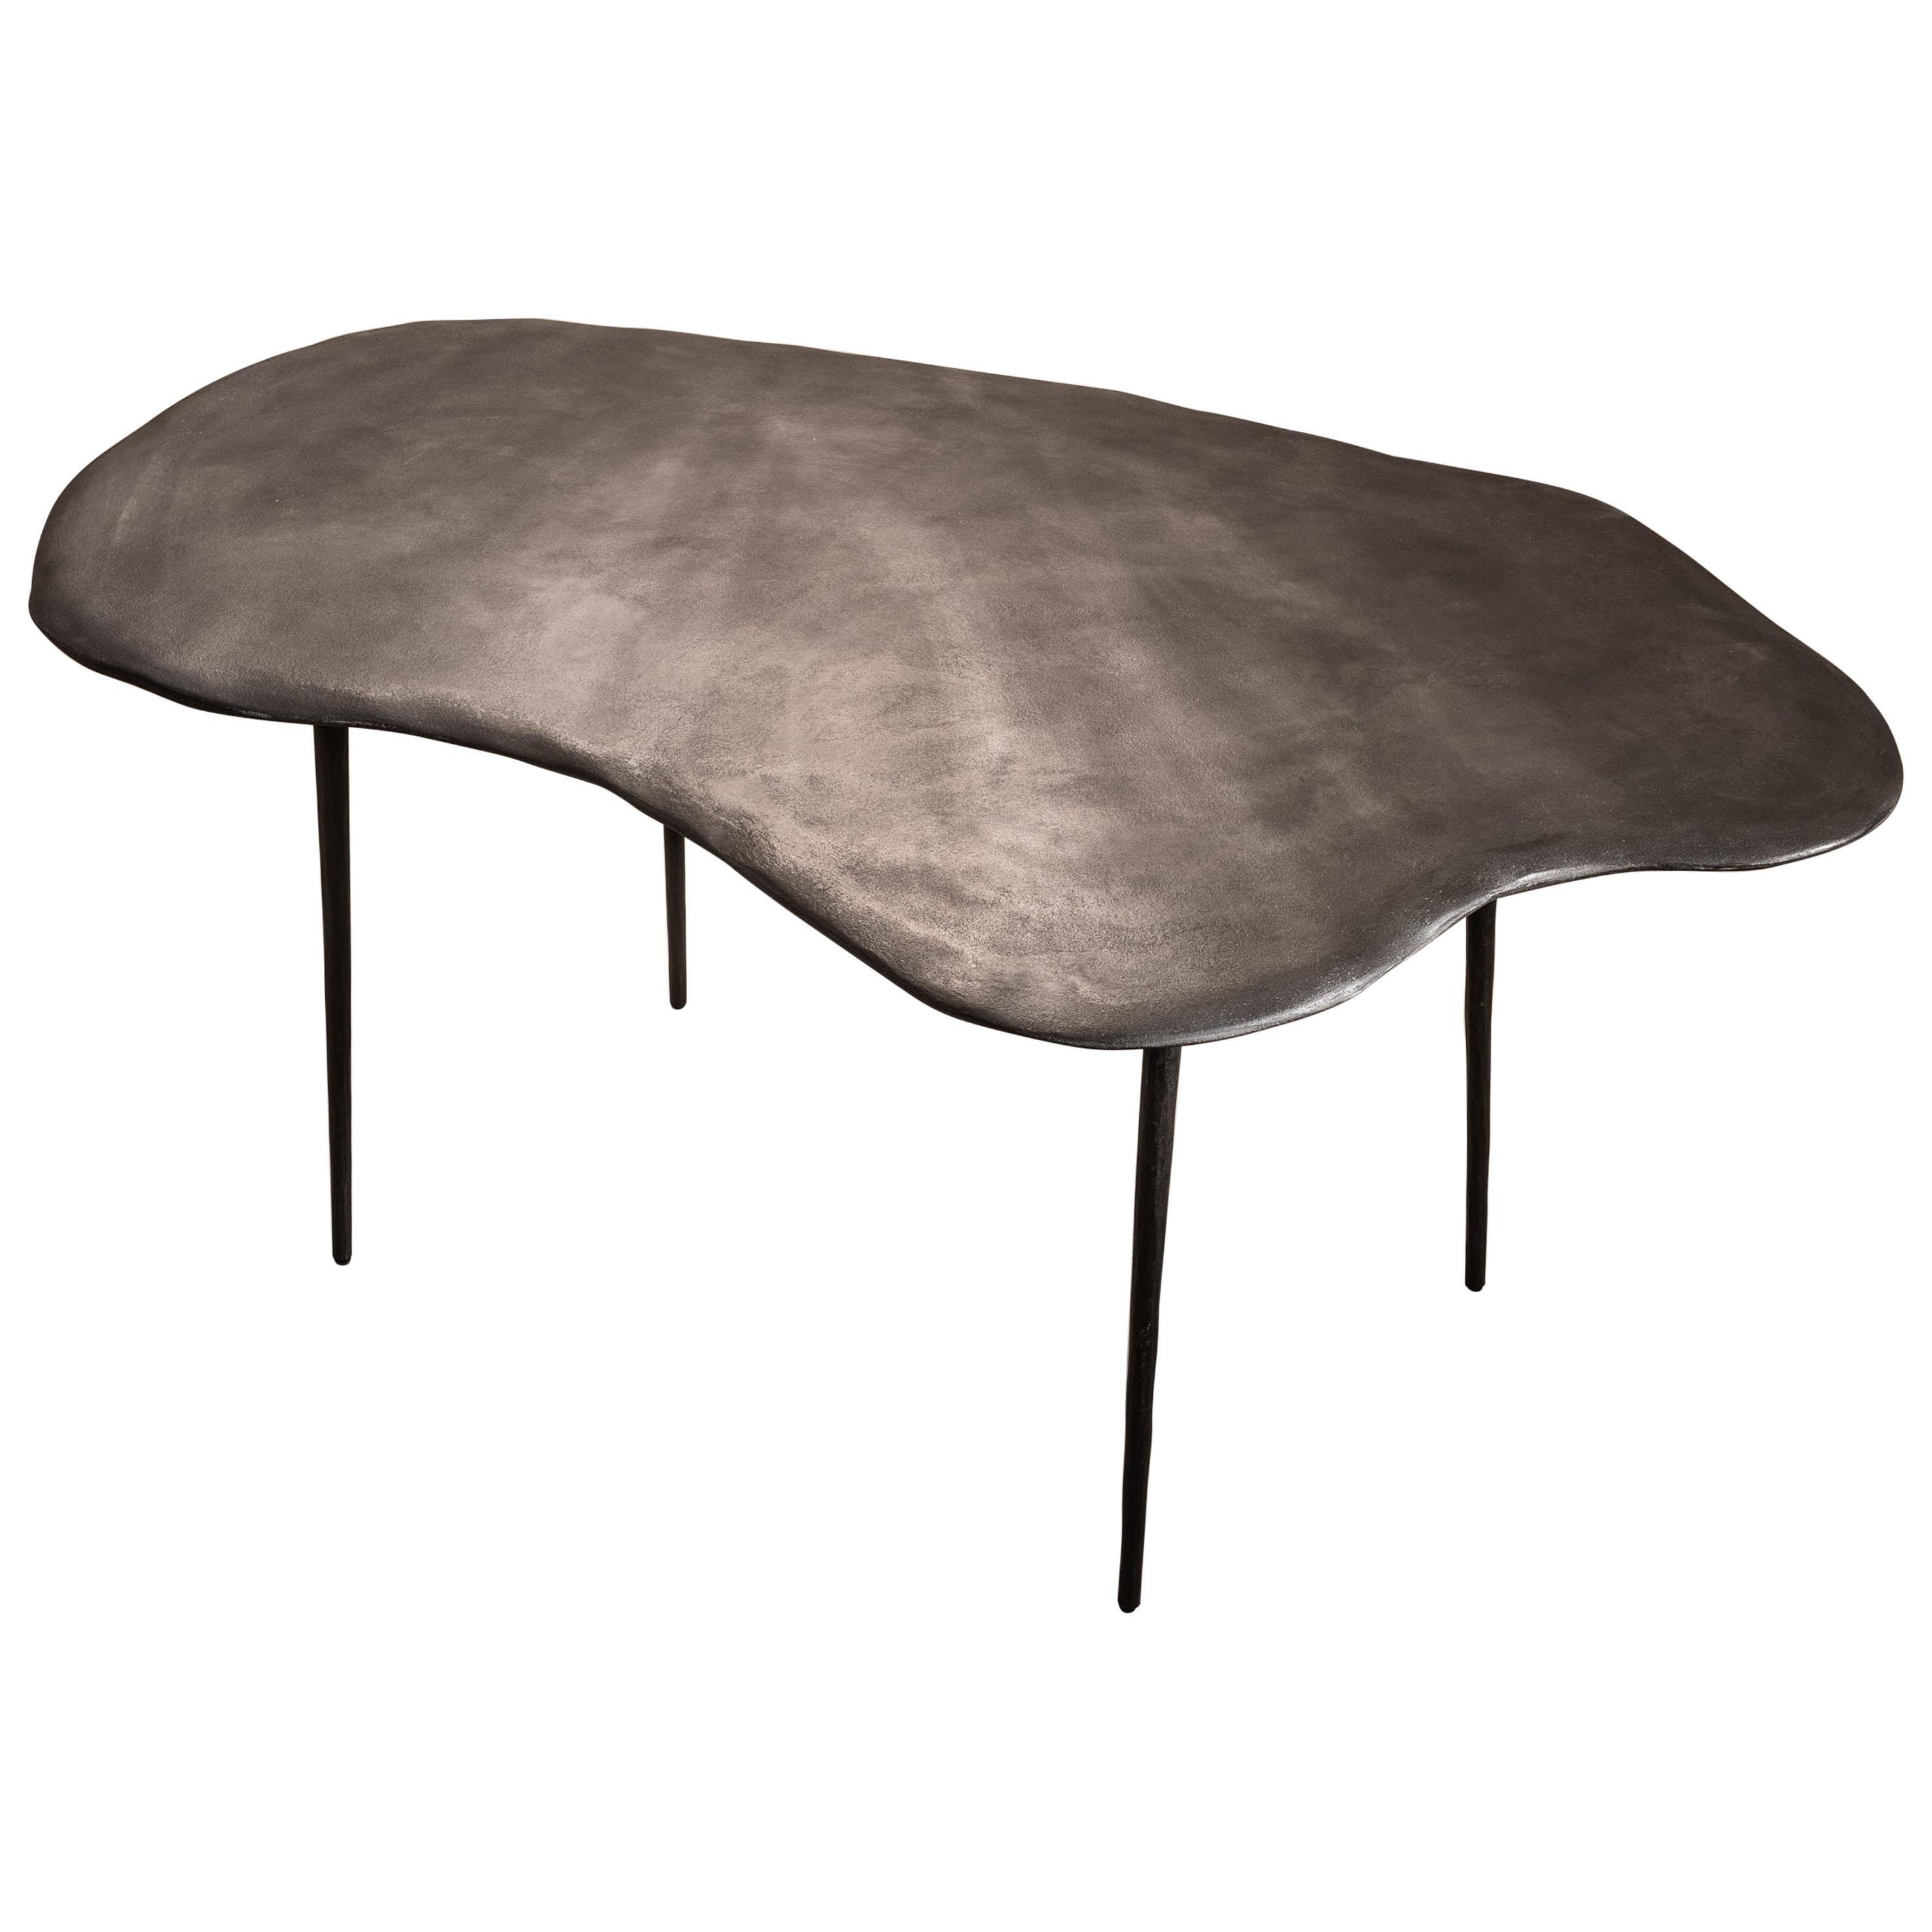 Varenna Table A by Studio Emblématique